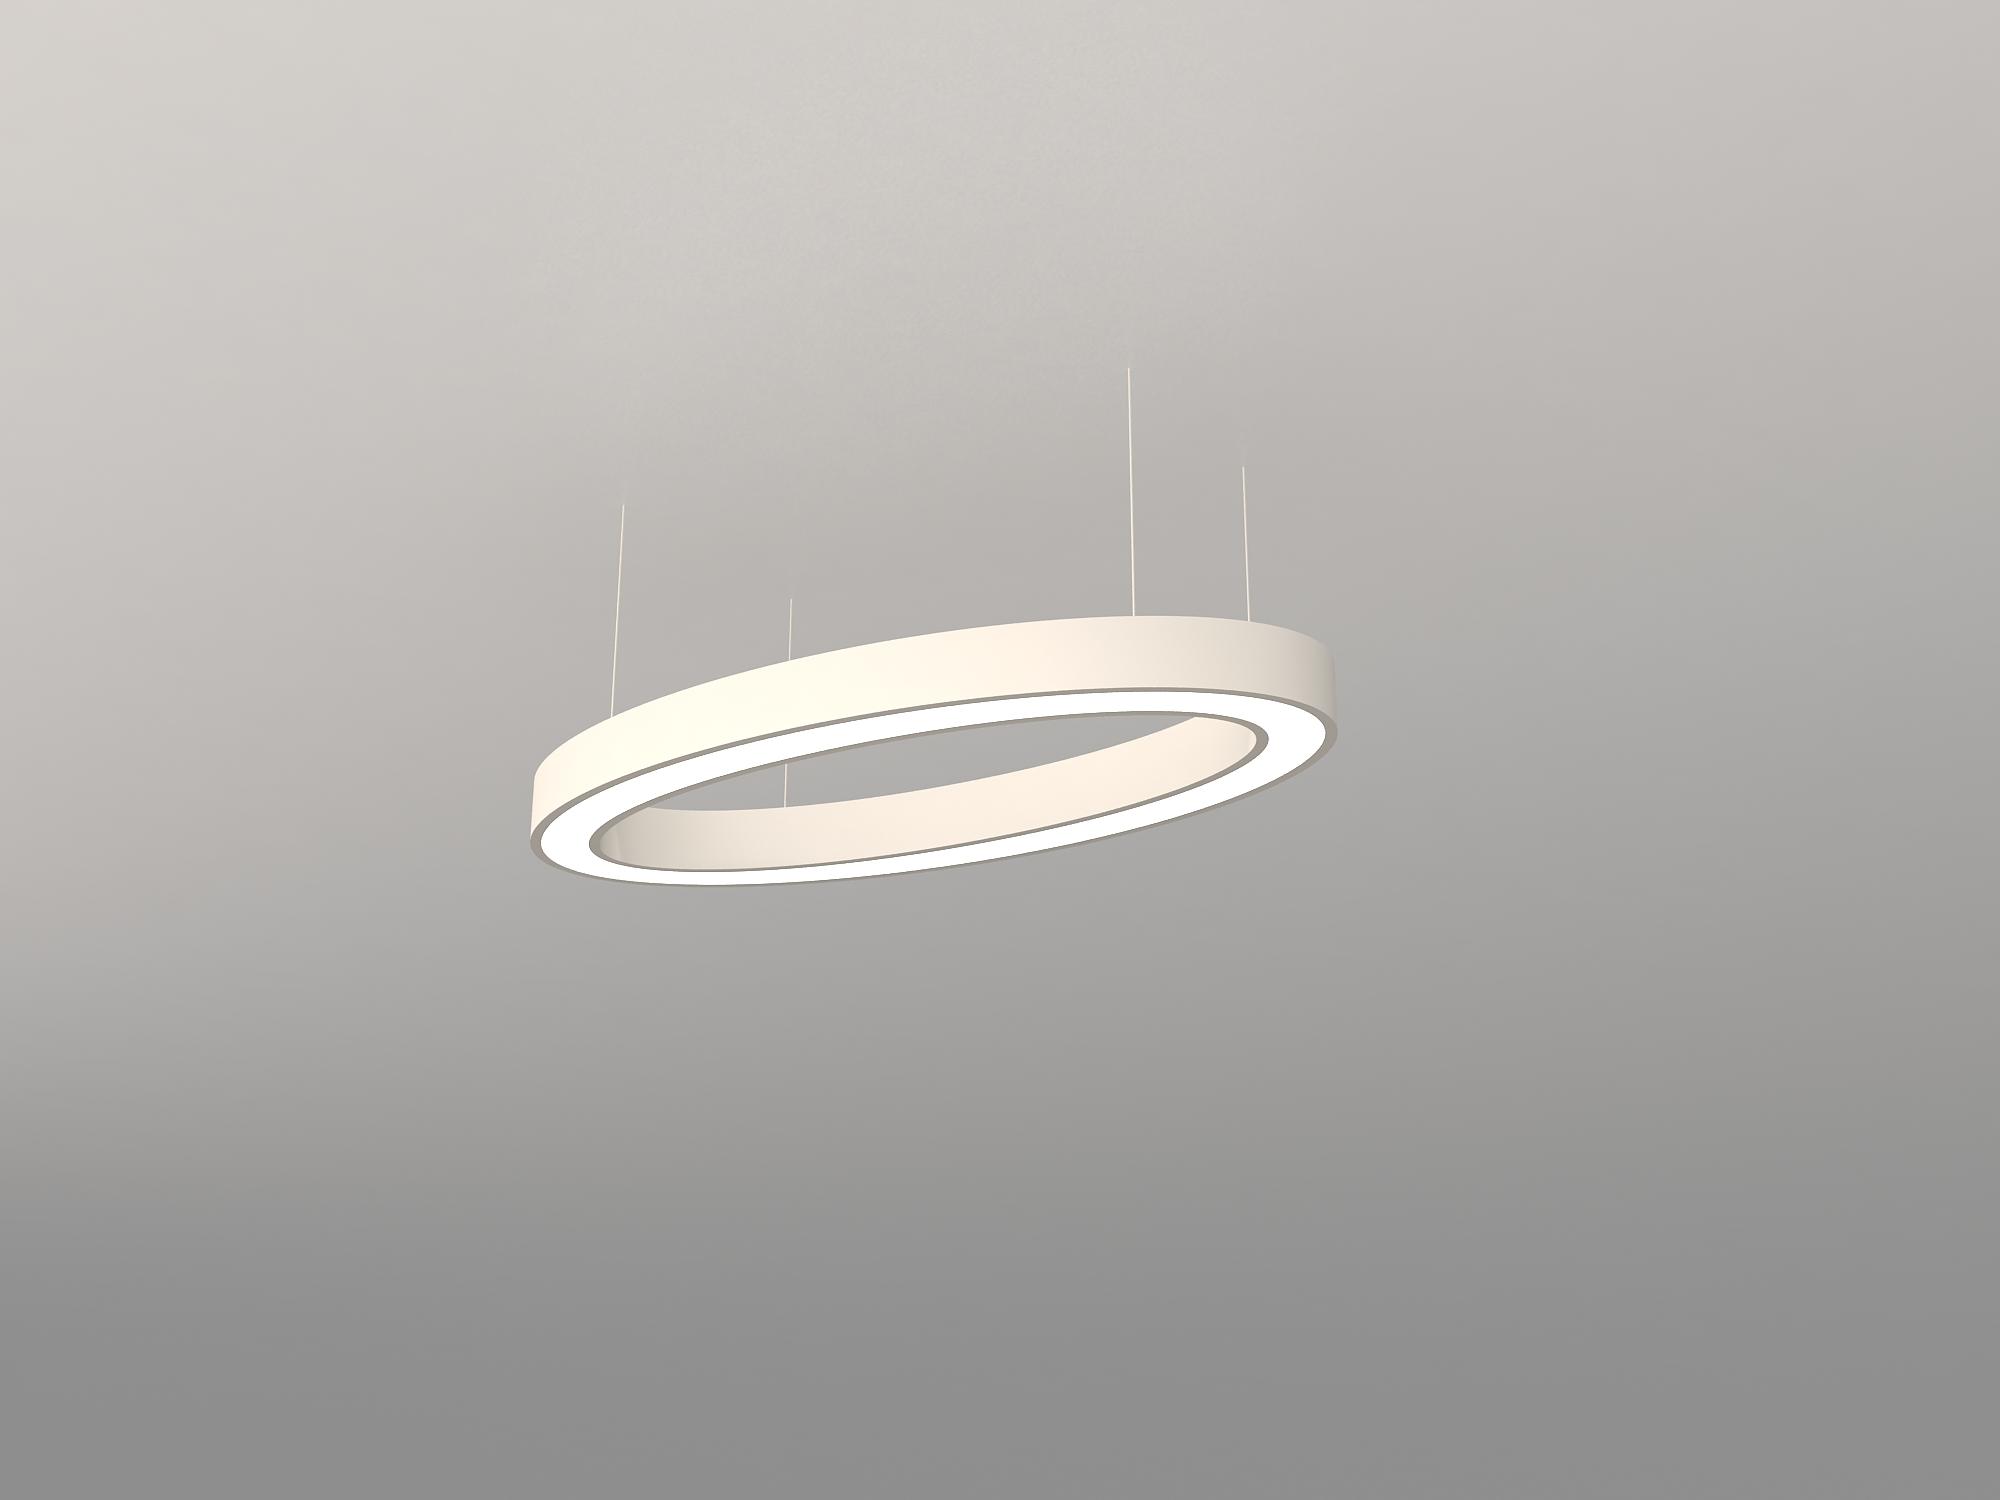 ARCHITECTURAL LIGHT - ELLIPSE SERIES